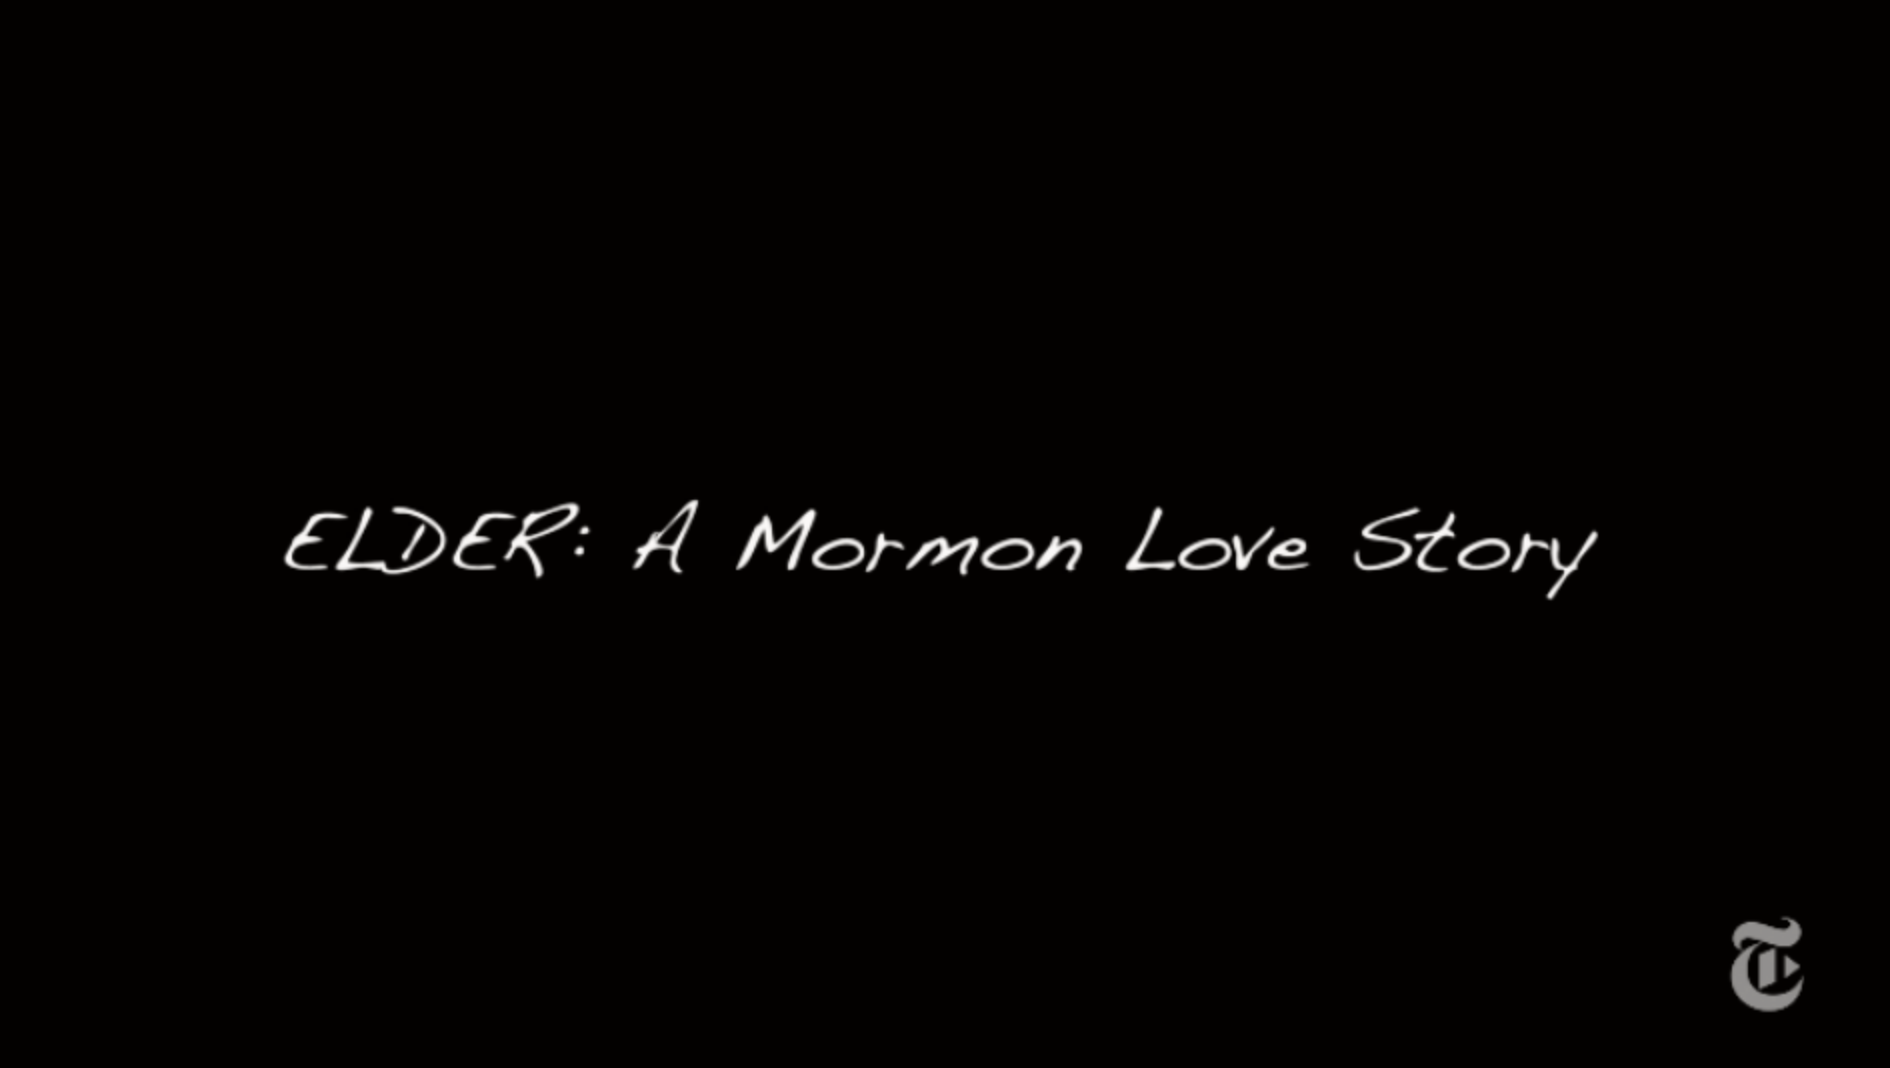 Elder a Mormon Love Story